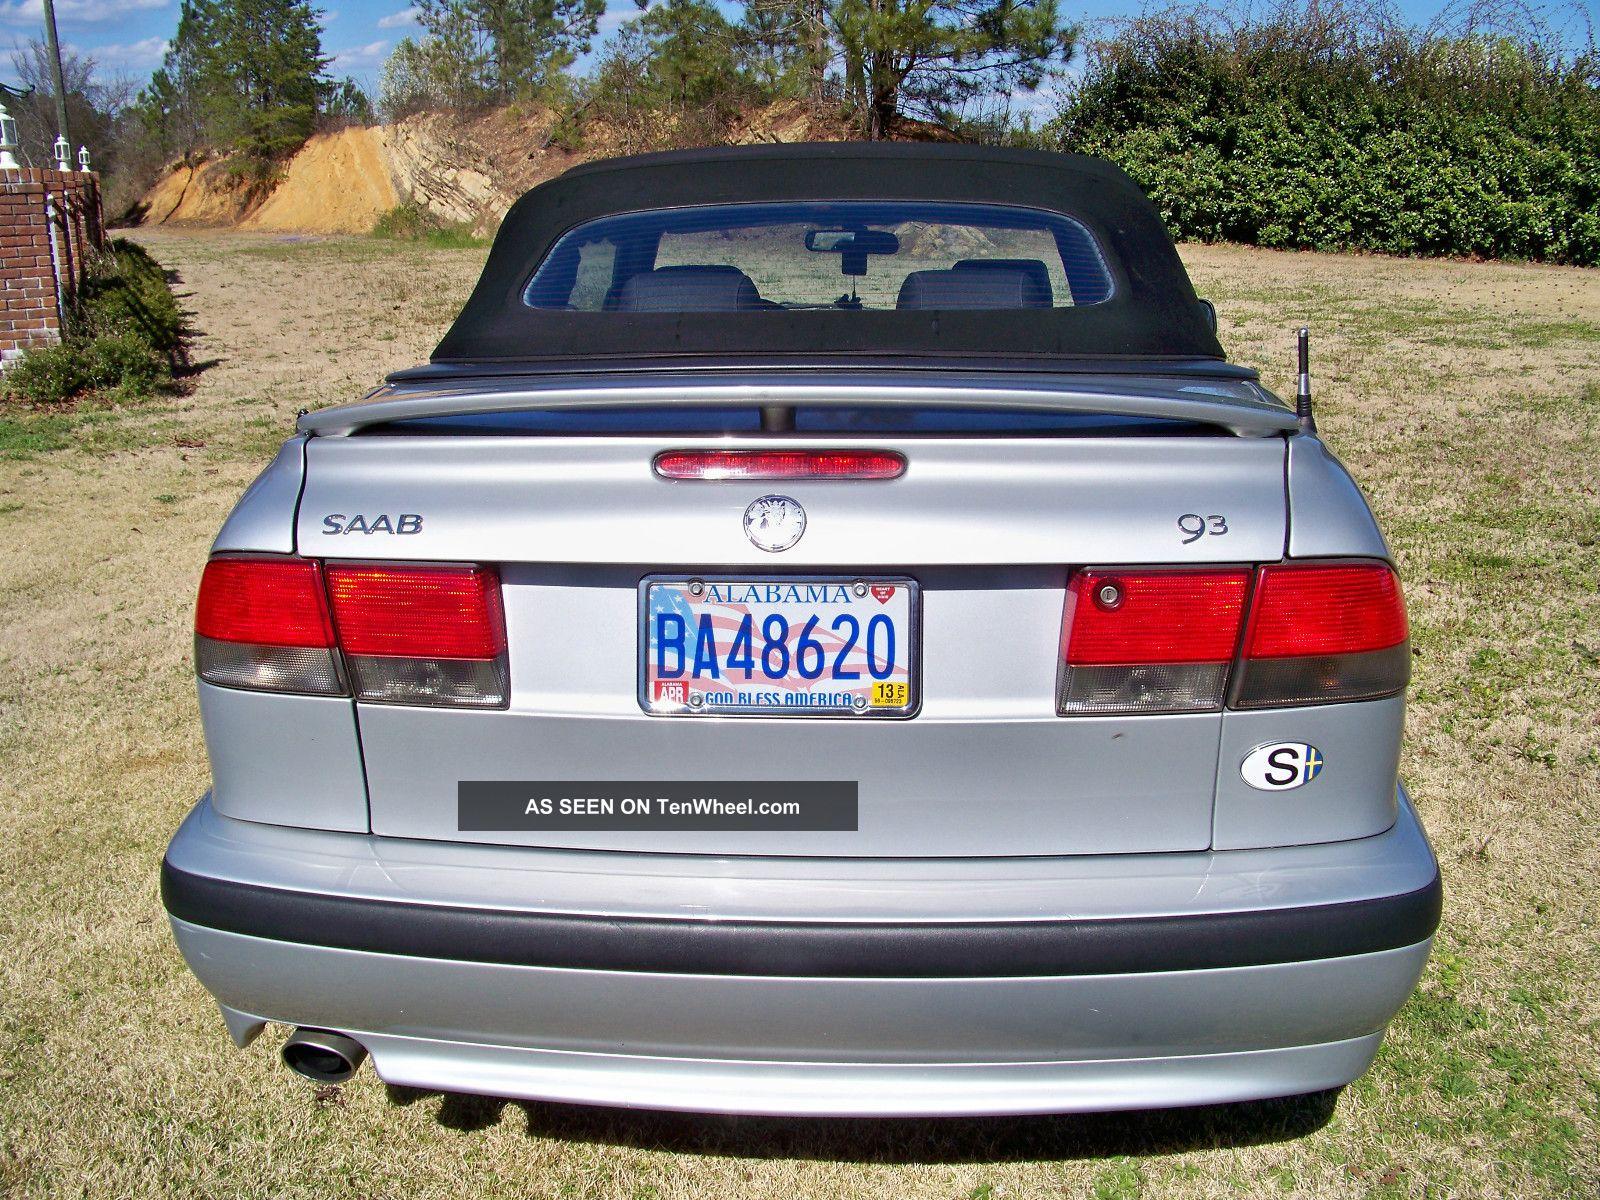 2002 saab 9 3 2 door convertible automatic 2 0 engine turbo. Black Bedroom Furniture Sets. Home Design Ideas